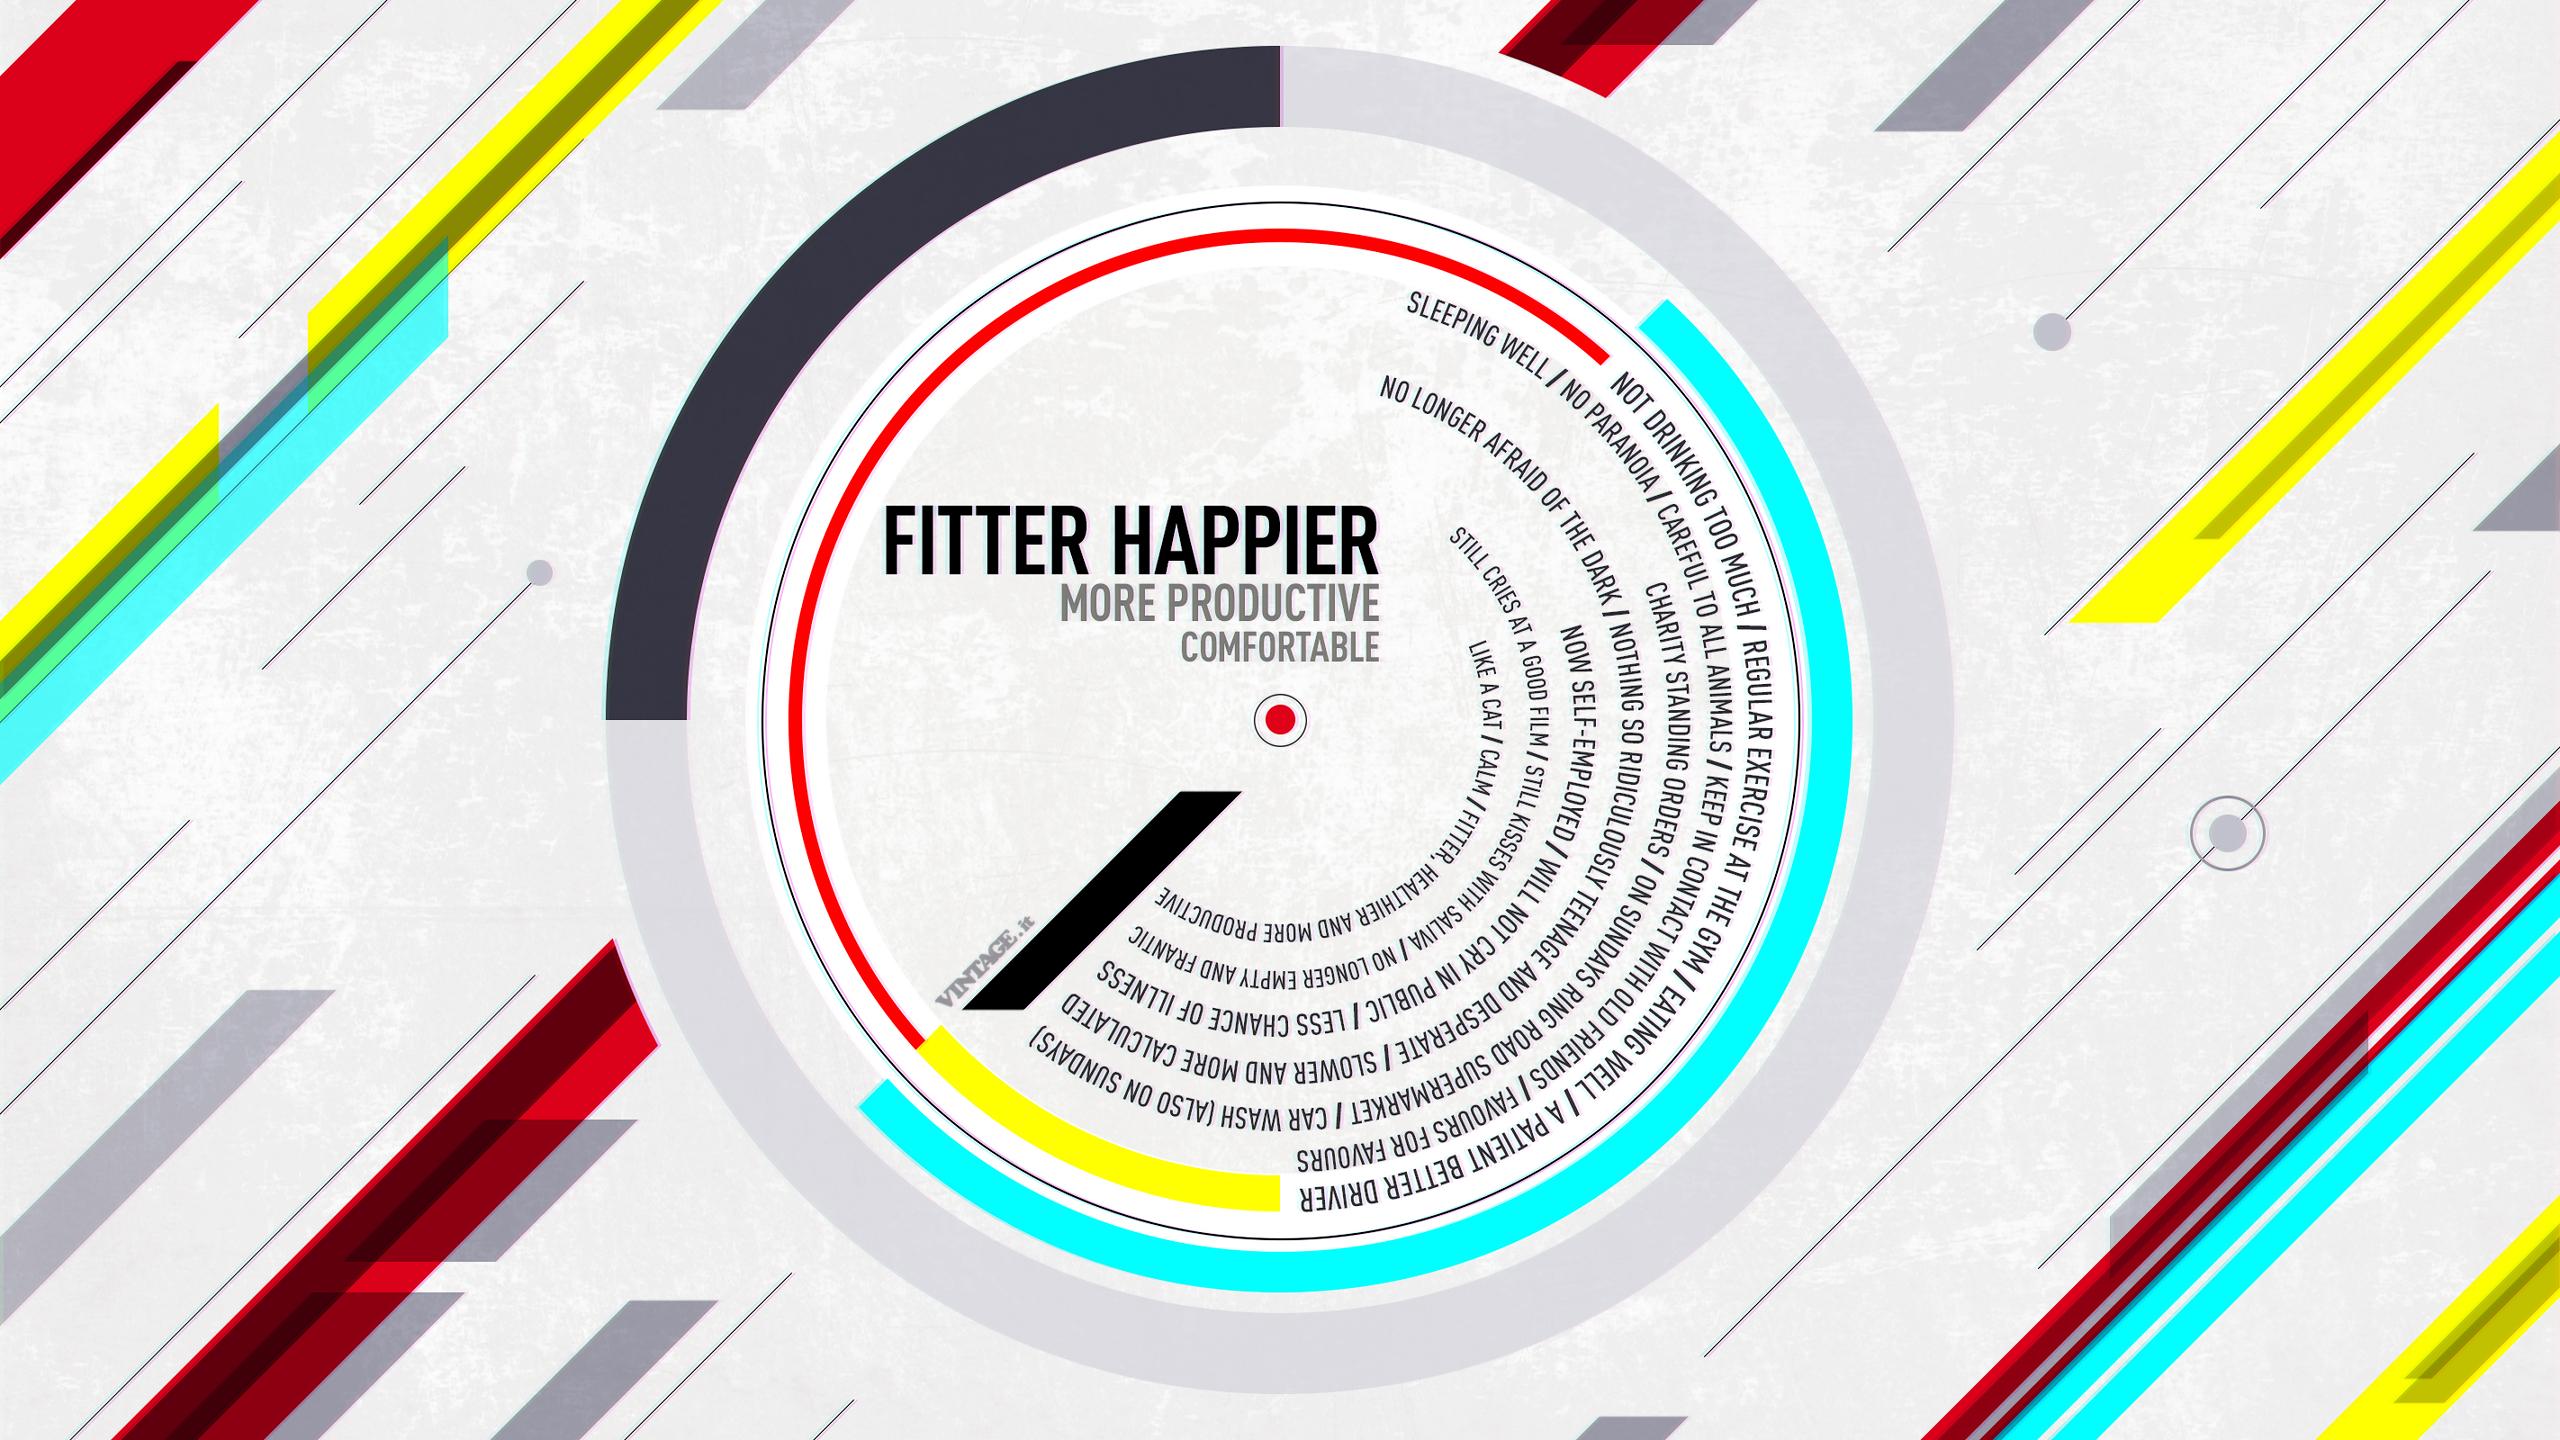 Fitter happier radiohead wallpaper free desktop hd ipad iphone 1920x1080 voltagebd Choice Image